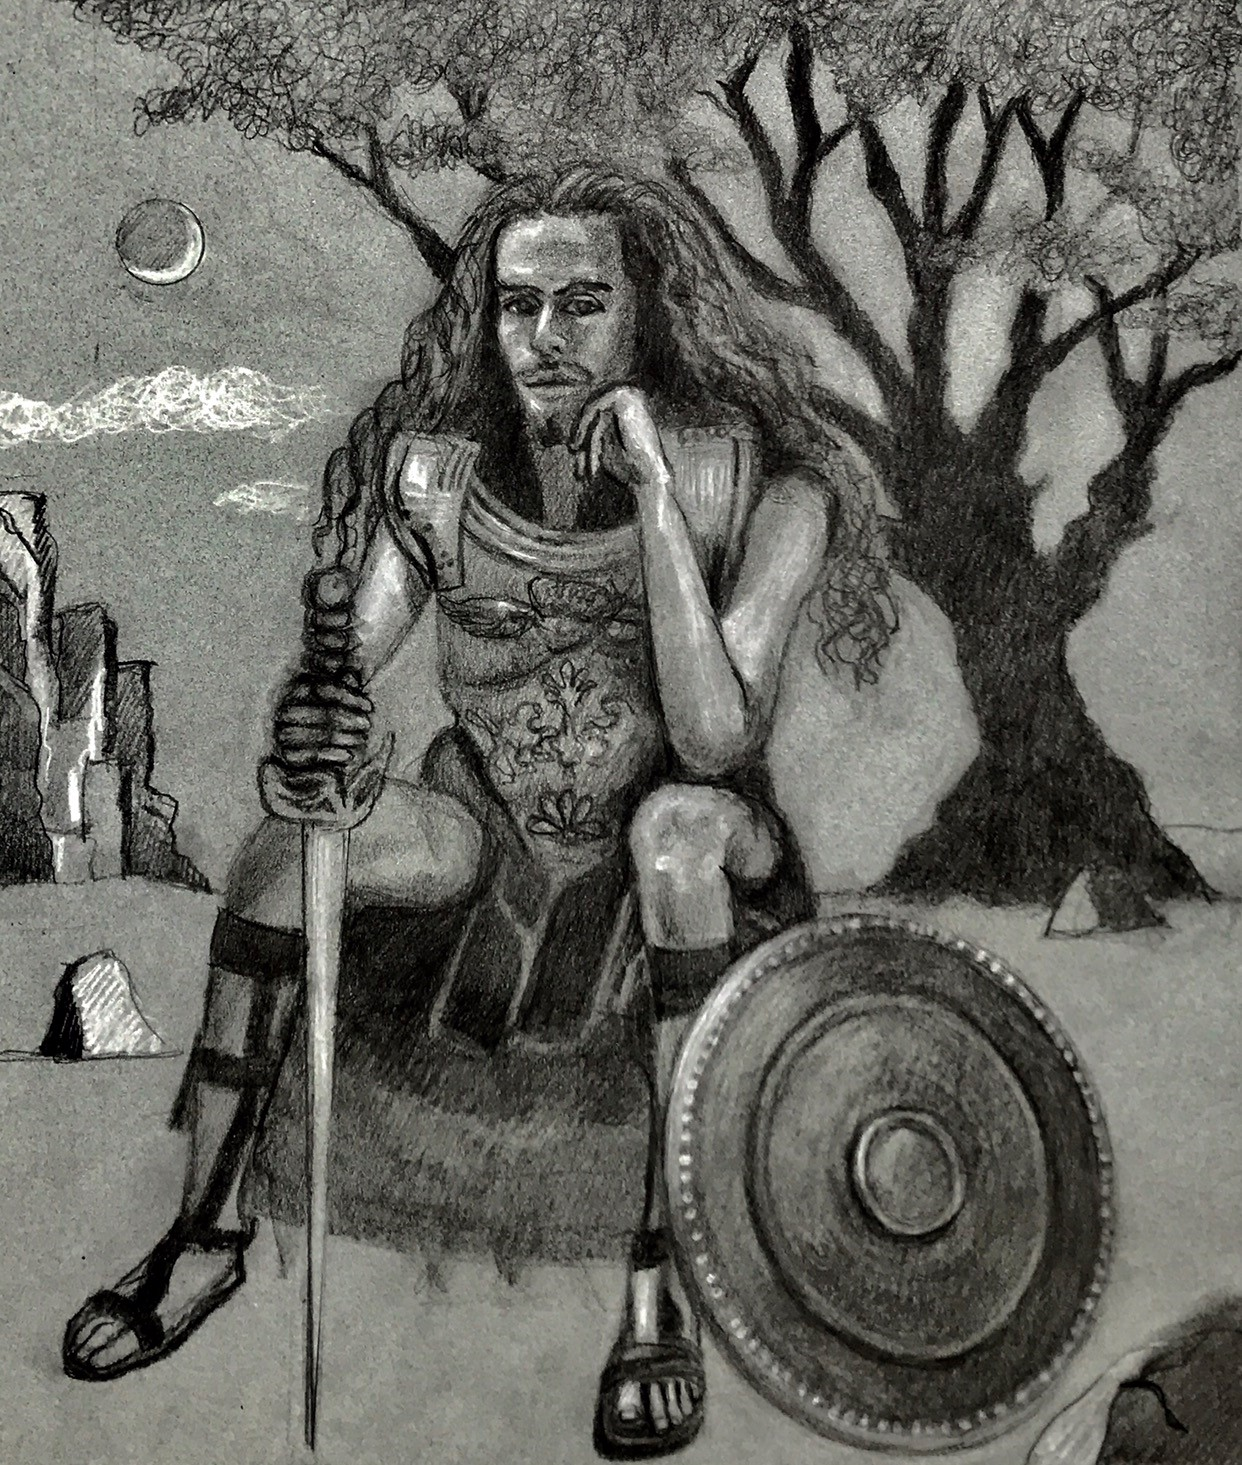 Goliath_ Reluctant Warrior 5_18_17.jpg